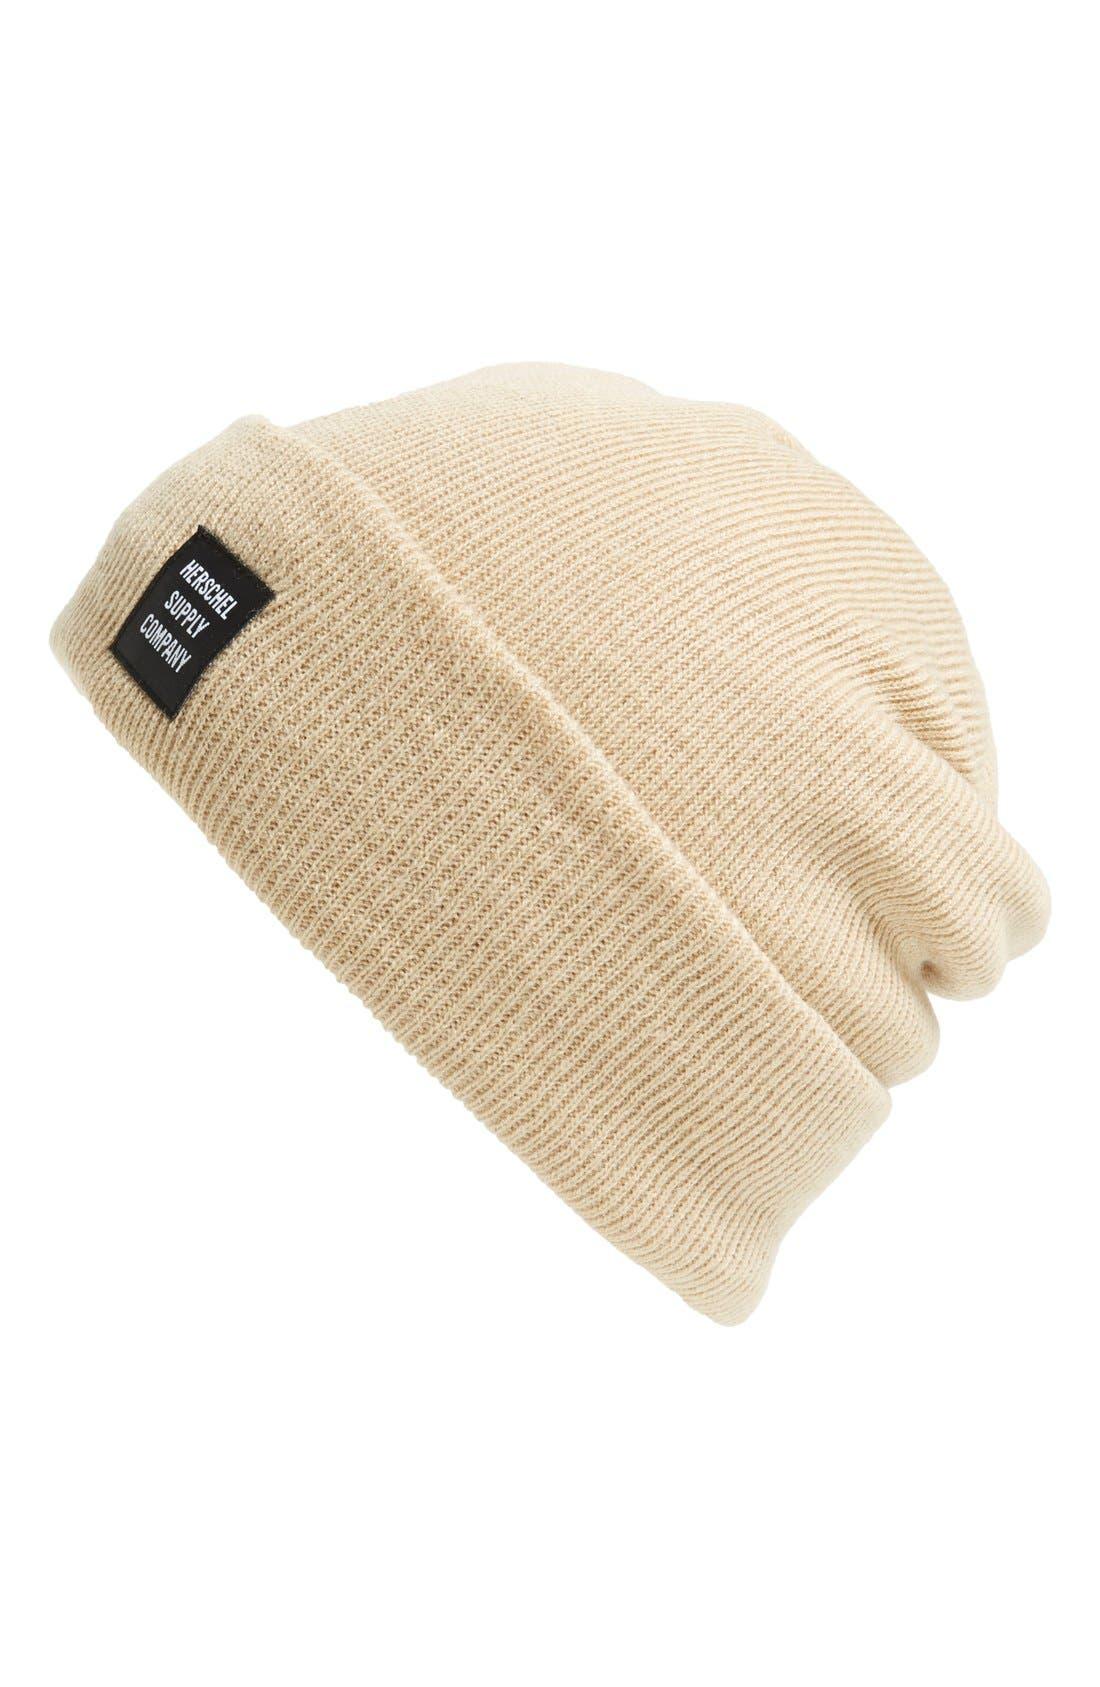 Alternate Image 1 Selected - Herschel Supply Co. 'Abbott' Knit Cap